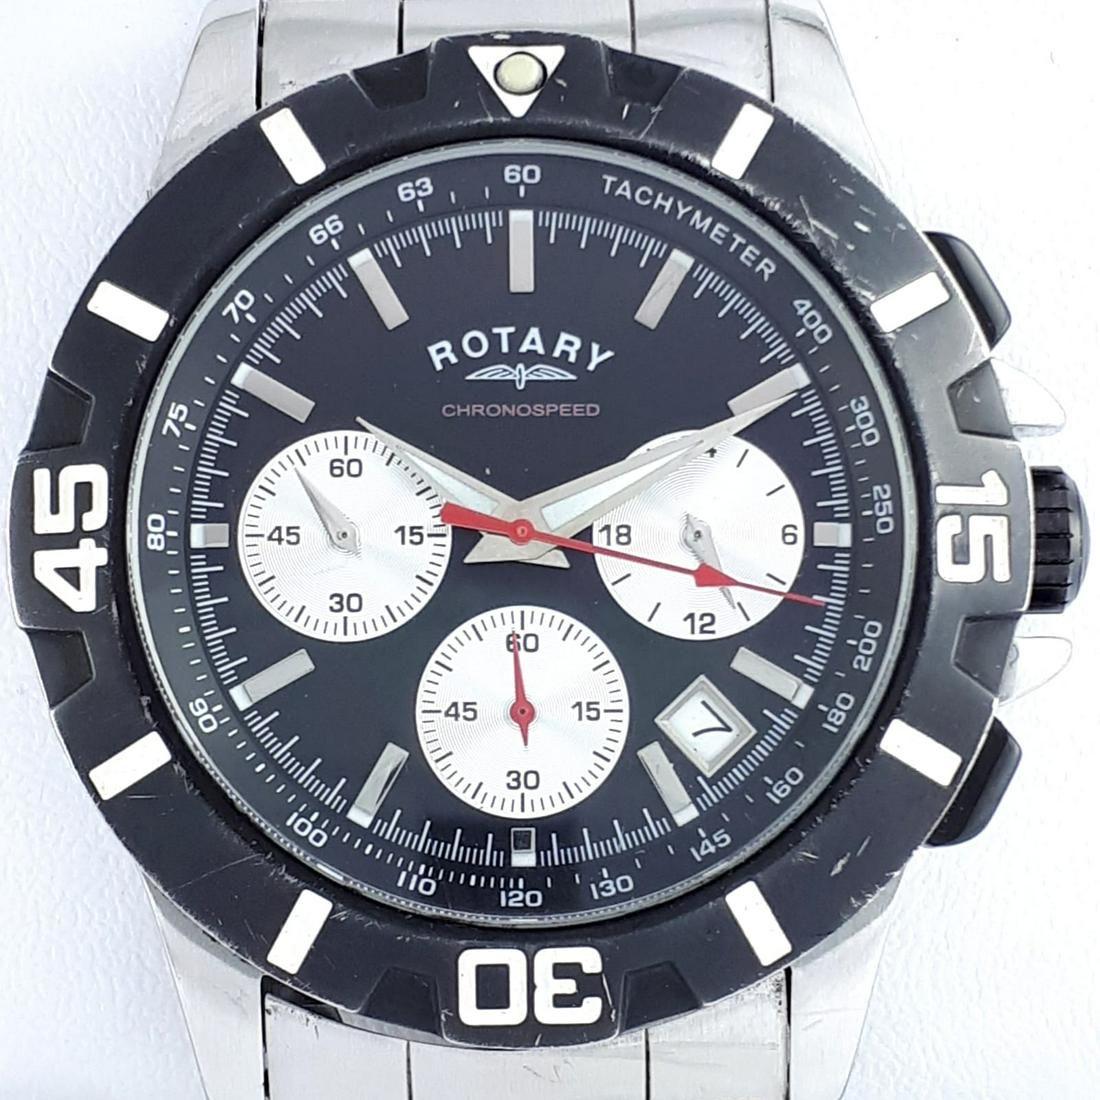 Rotary - Chronospeed - Men - 2011-present